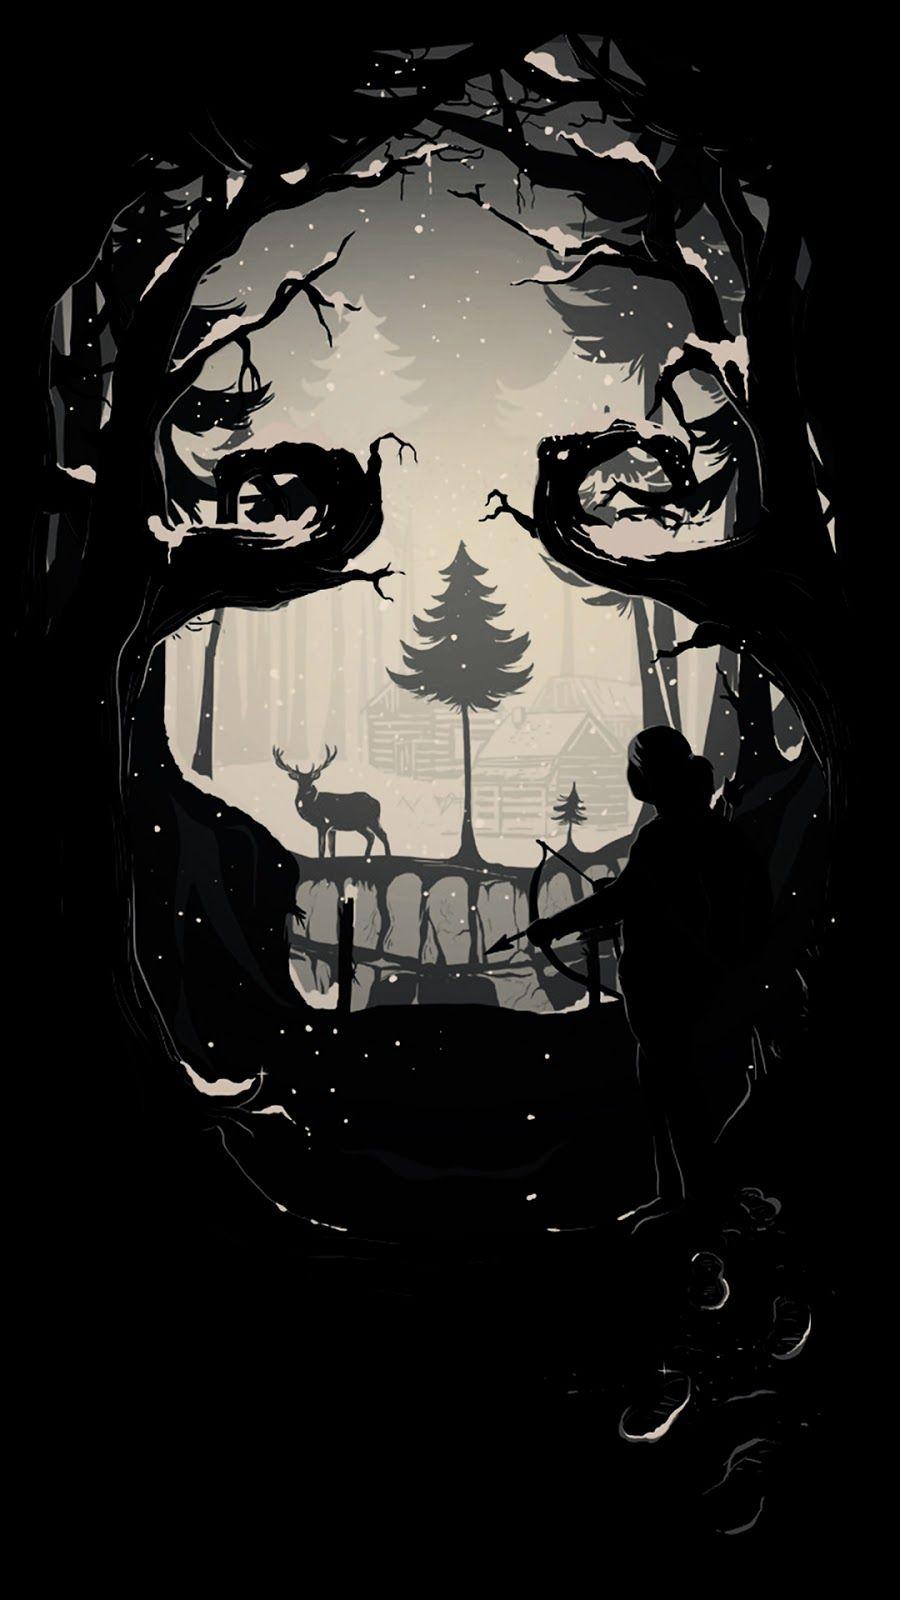 Amoled Wallpaper Hd The Last Of Us Heroscreen The Last Of Us Wallpaper Black Wallpaper